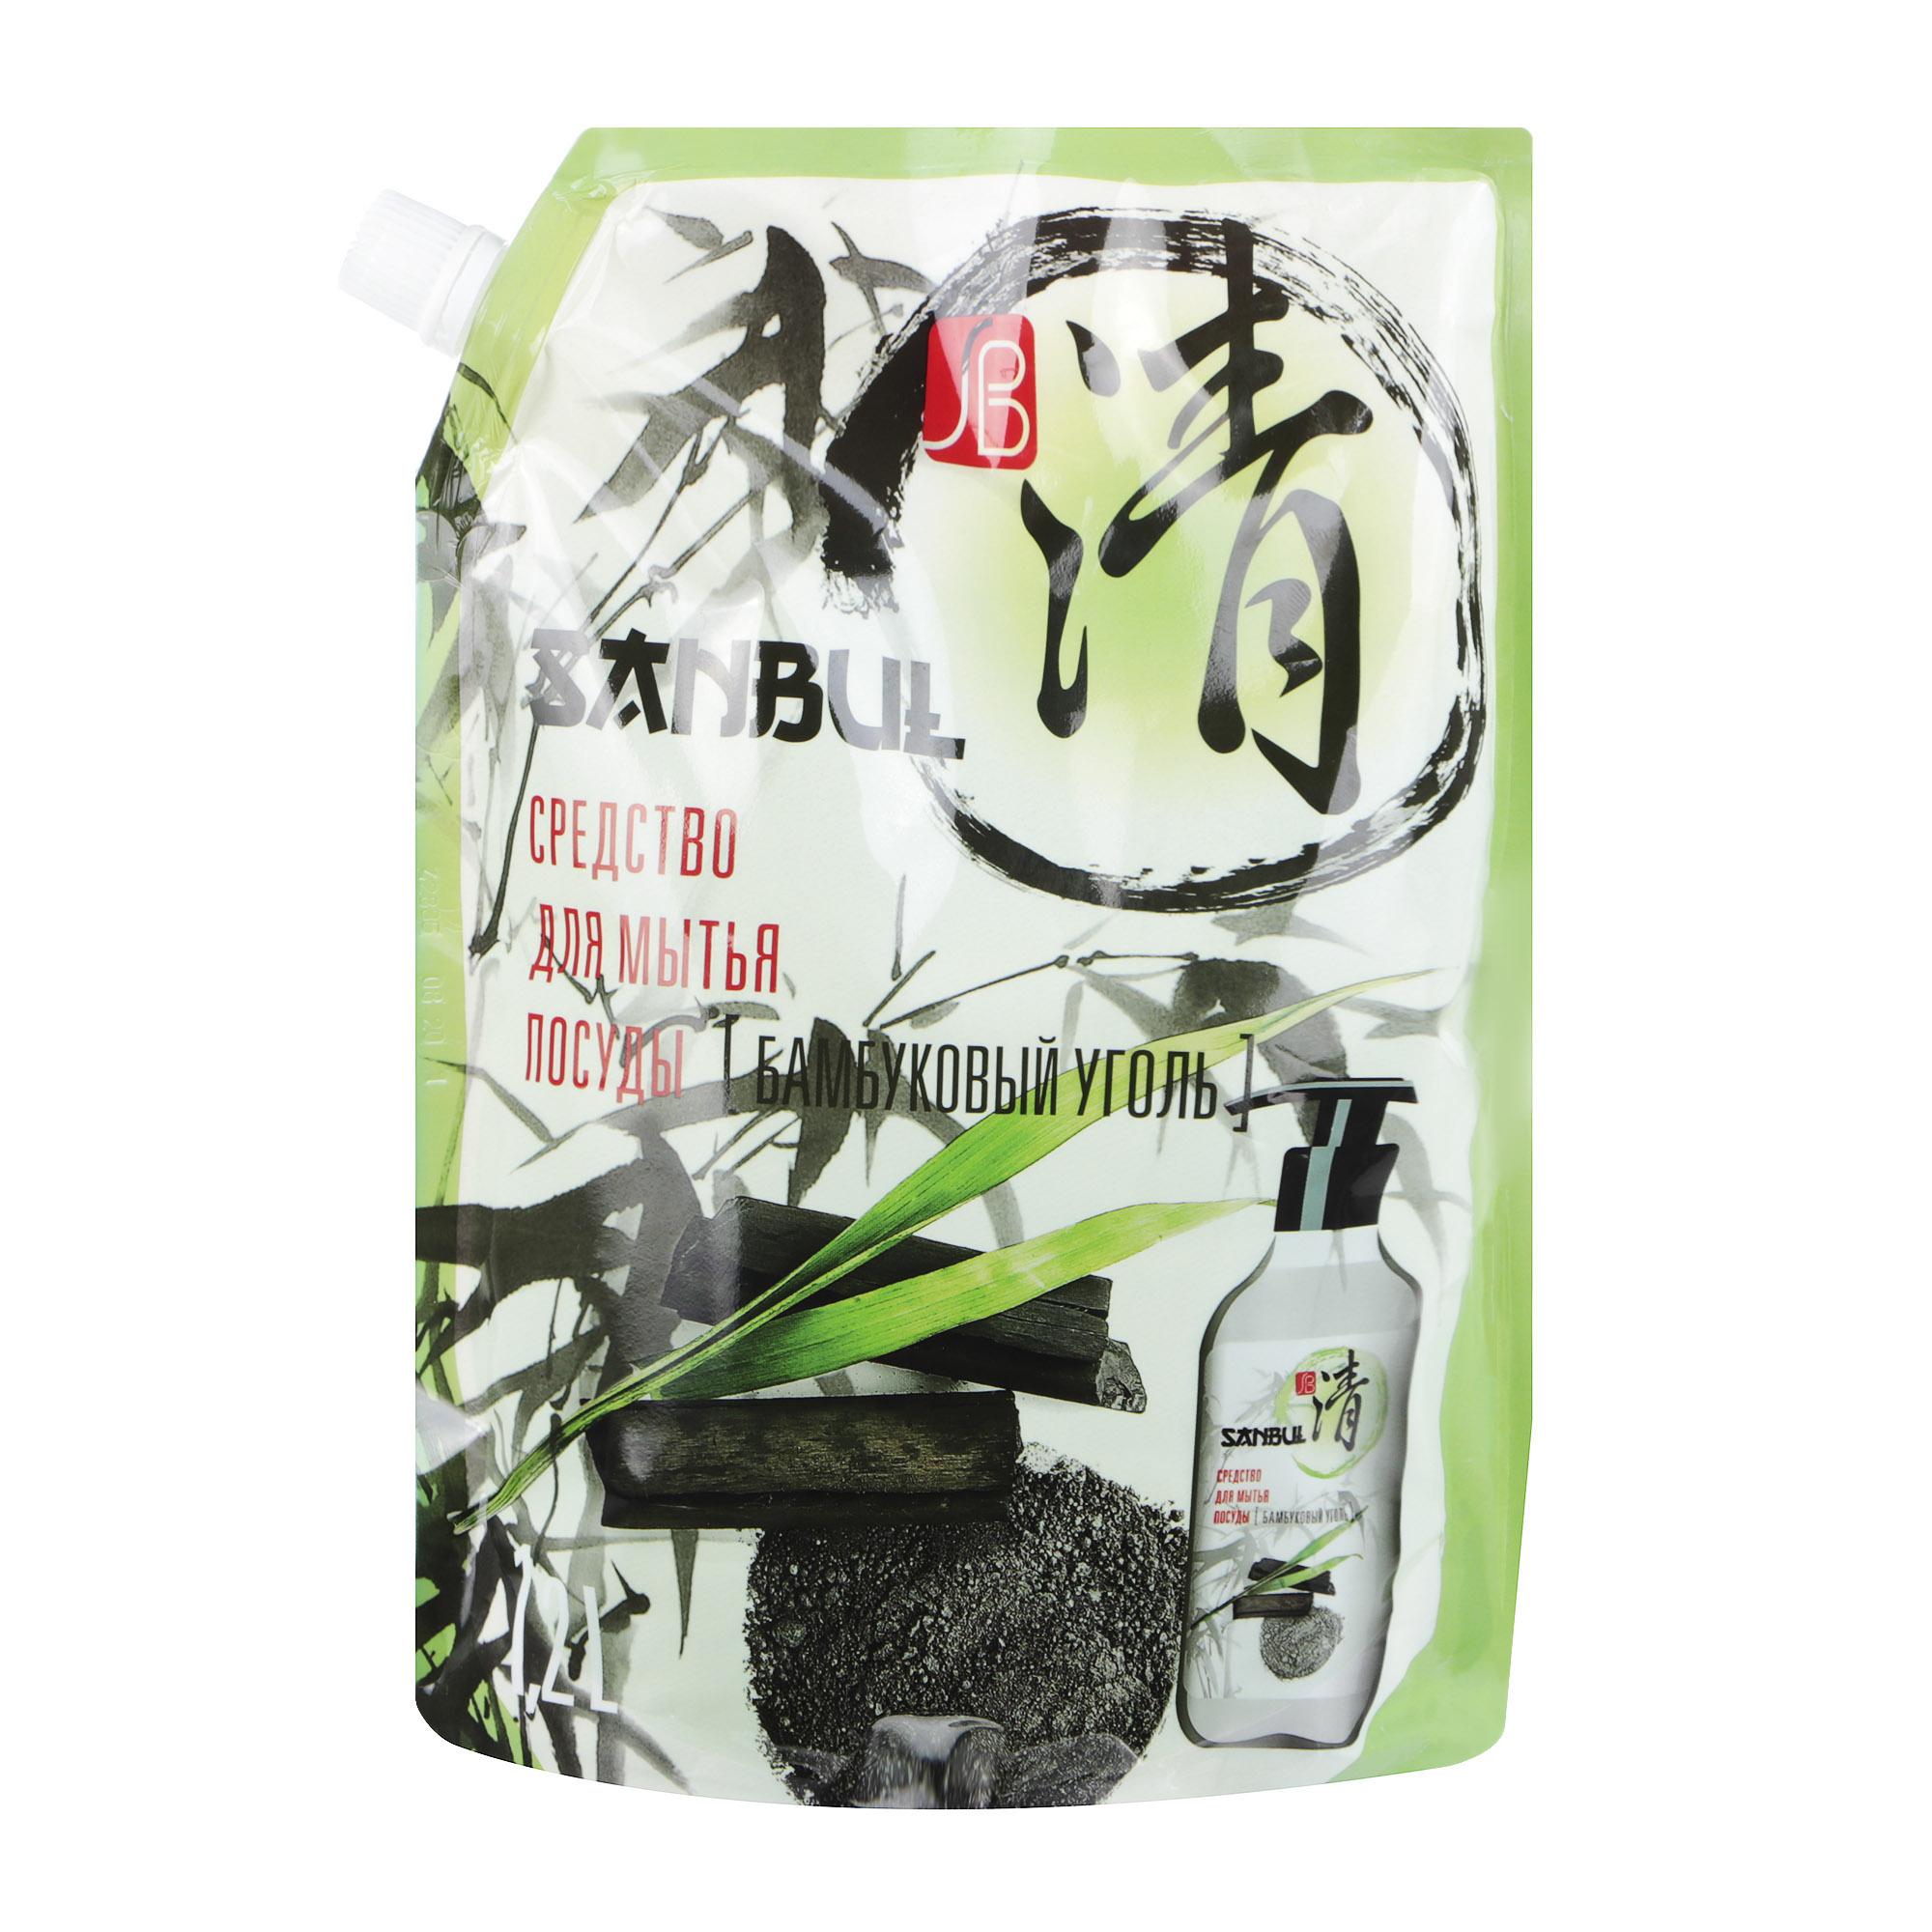 Средство для мытья посуды SANBUL Бамбуковый уголь 1,2 л